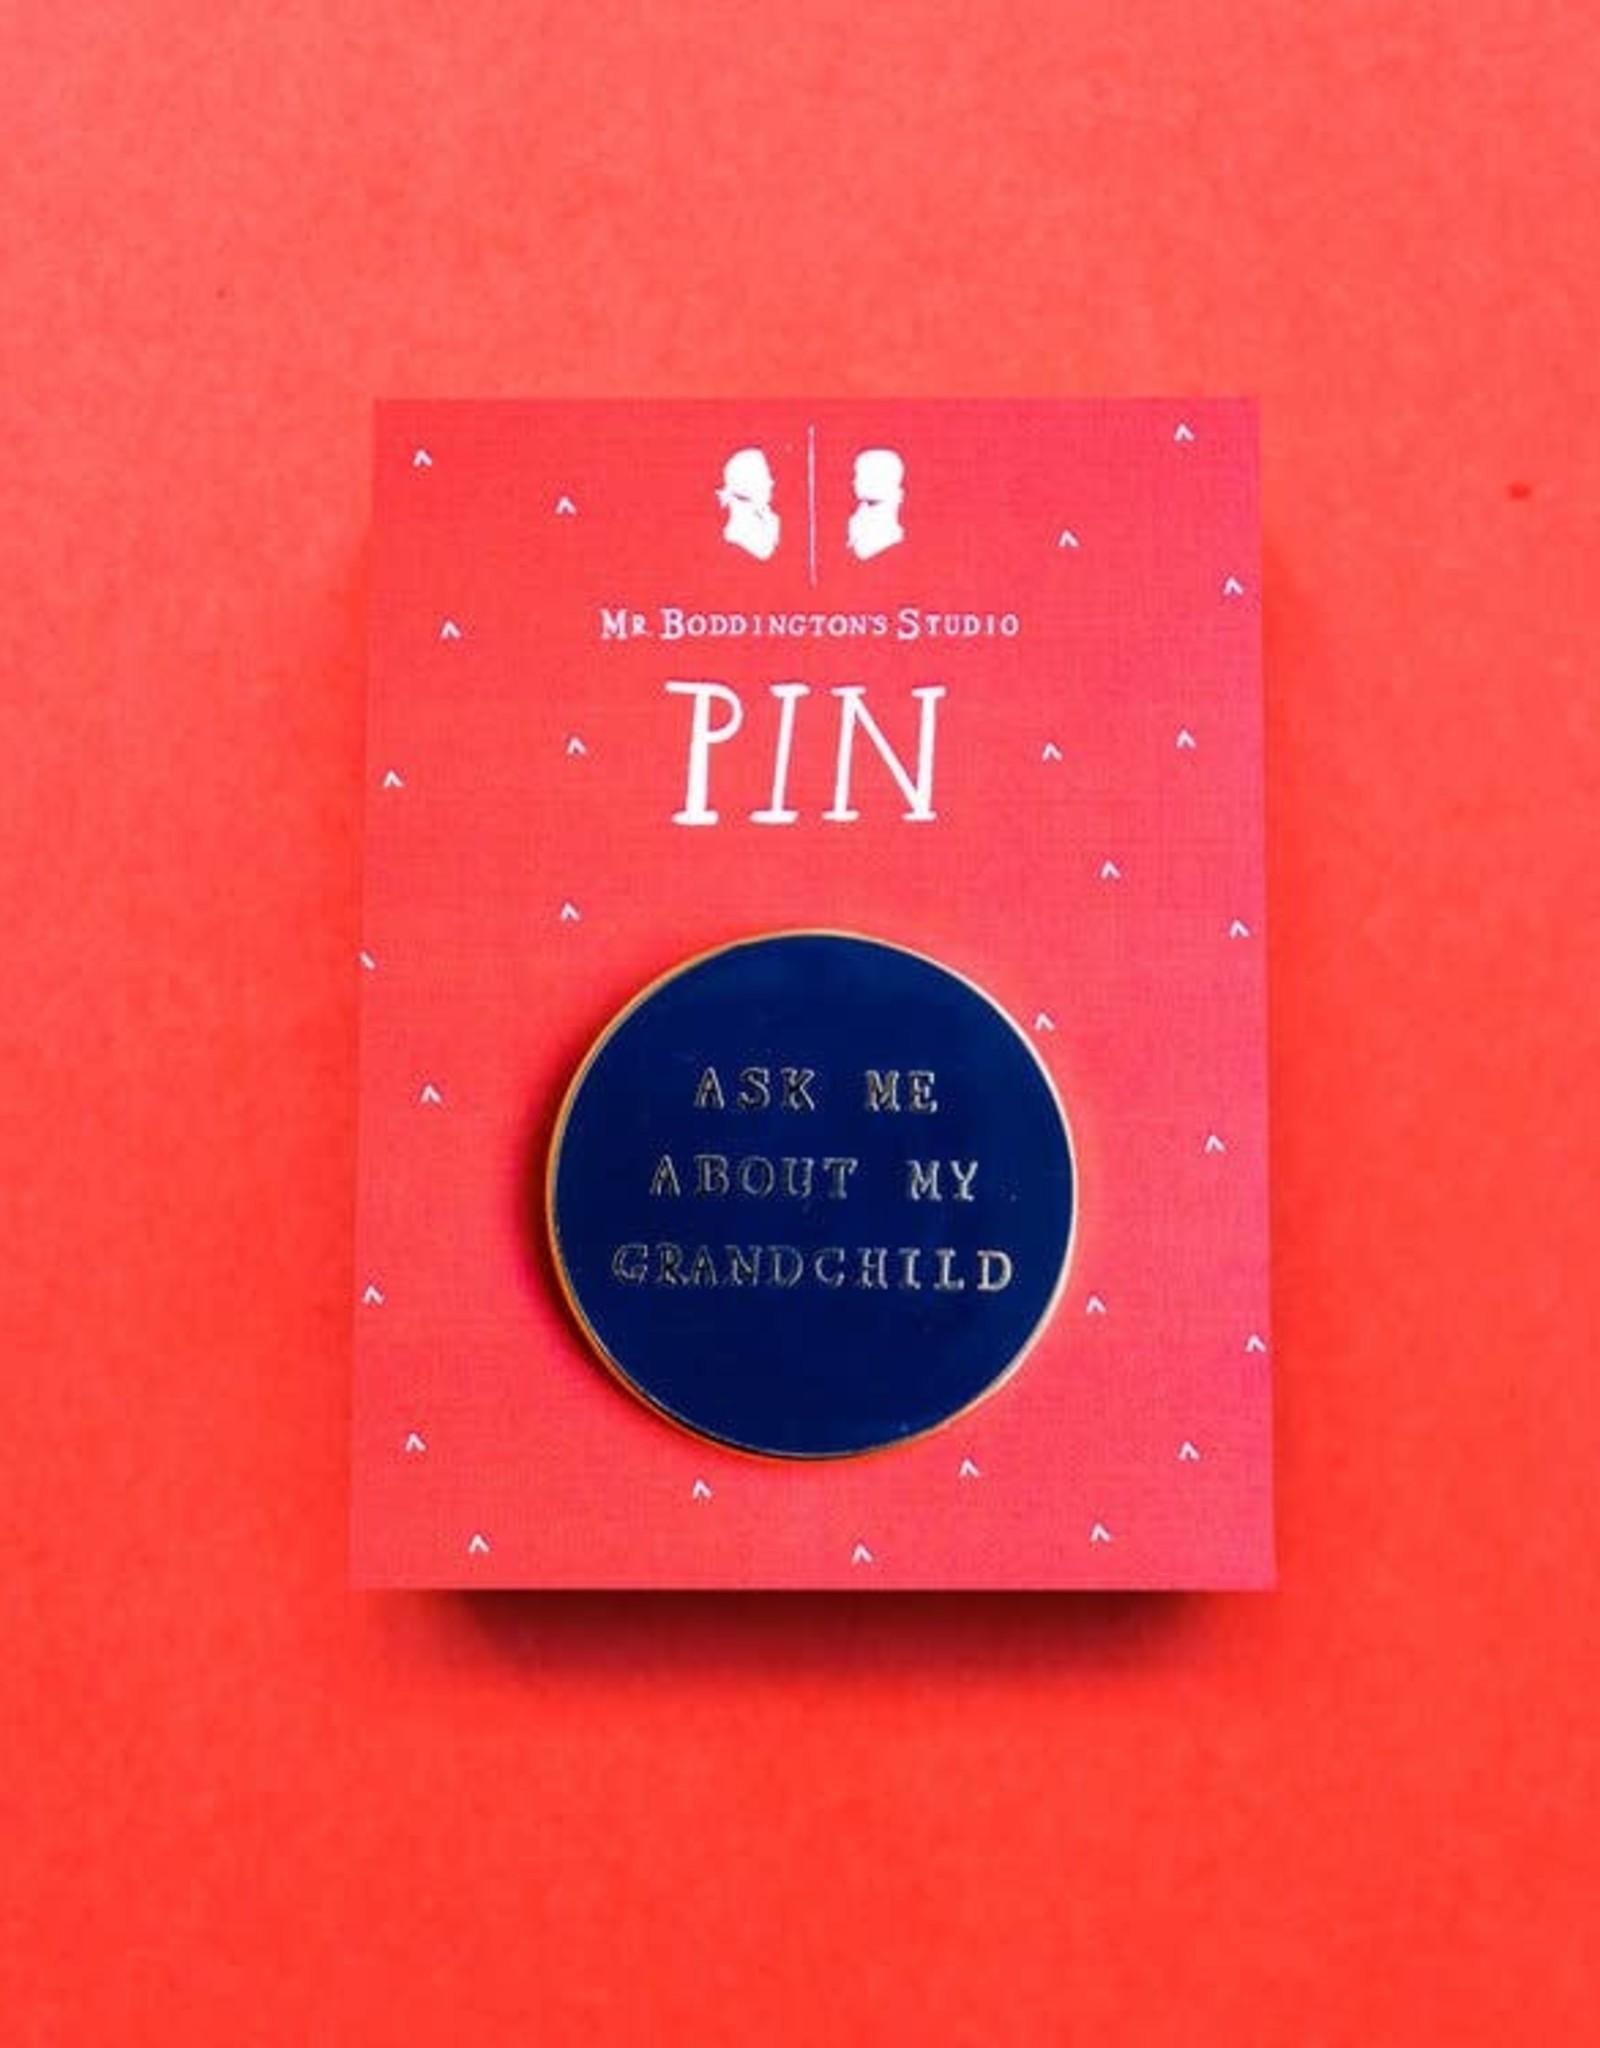 Mr. Boddington's Mr. Boddington's | Ask Me About My Grandchild Pin